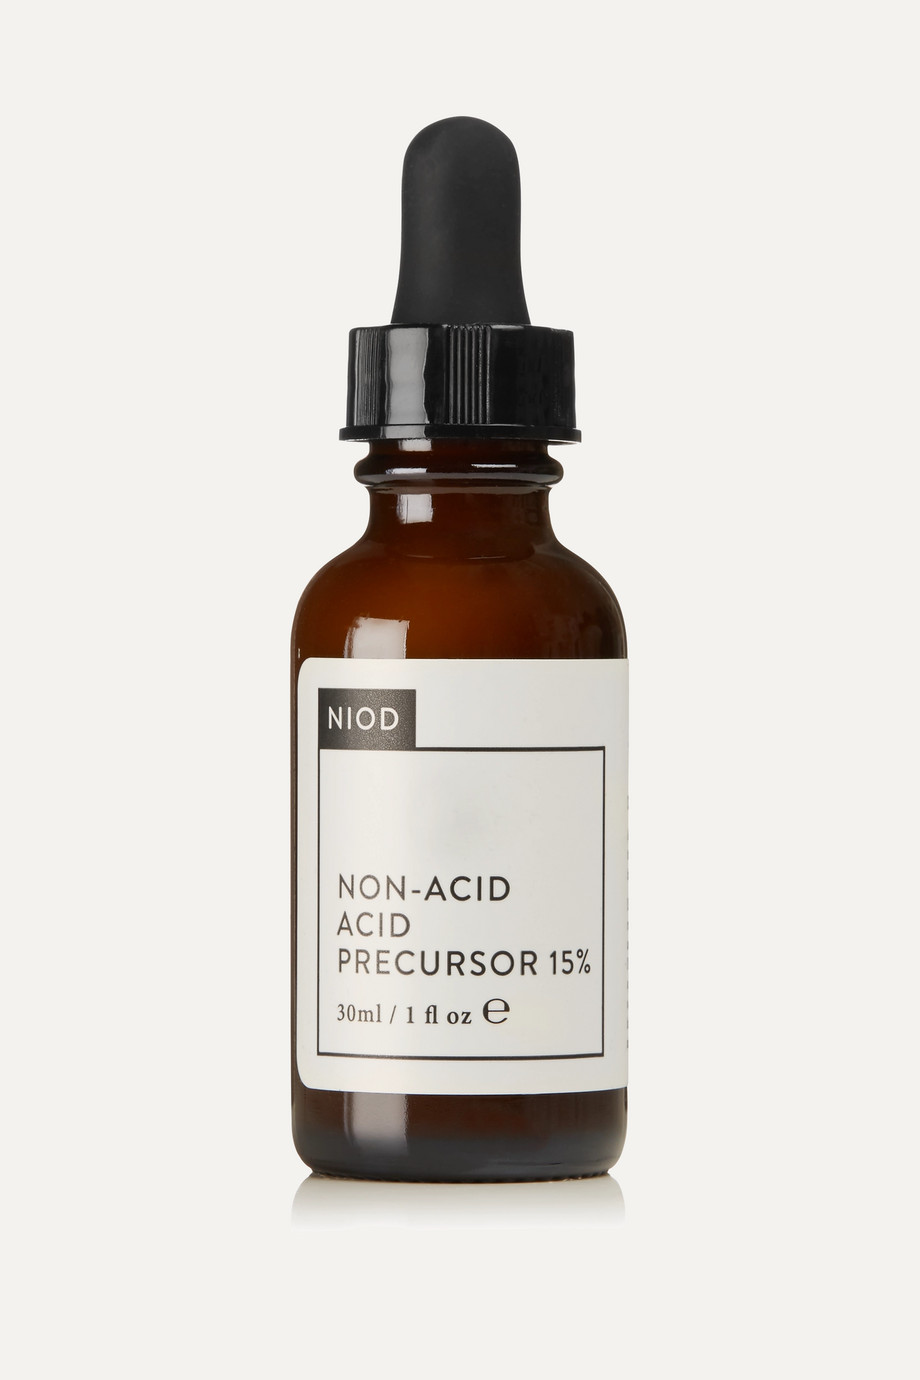 NIOD Non-Acid Acid Precursor 15%, 30ml